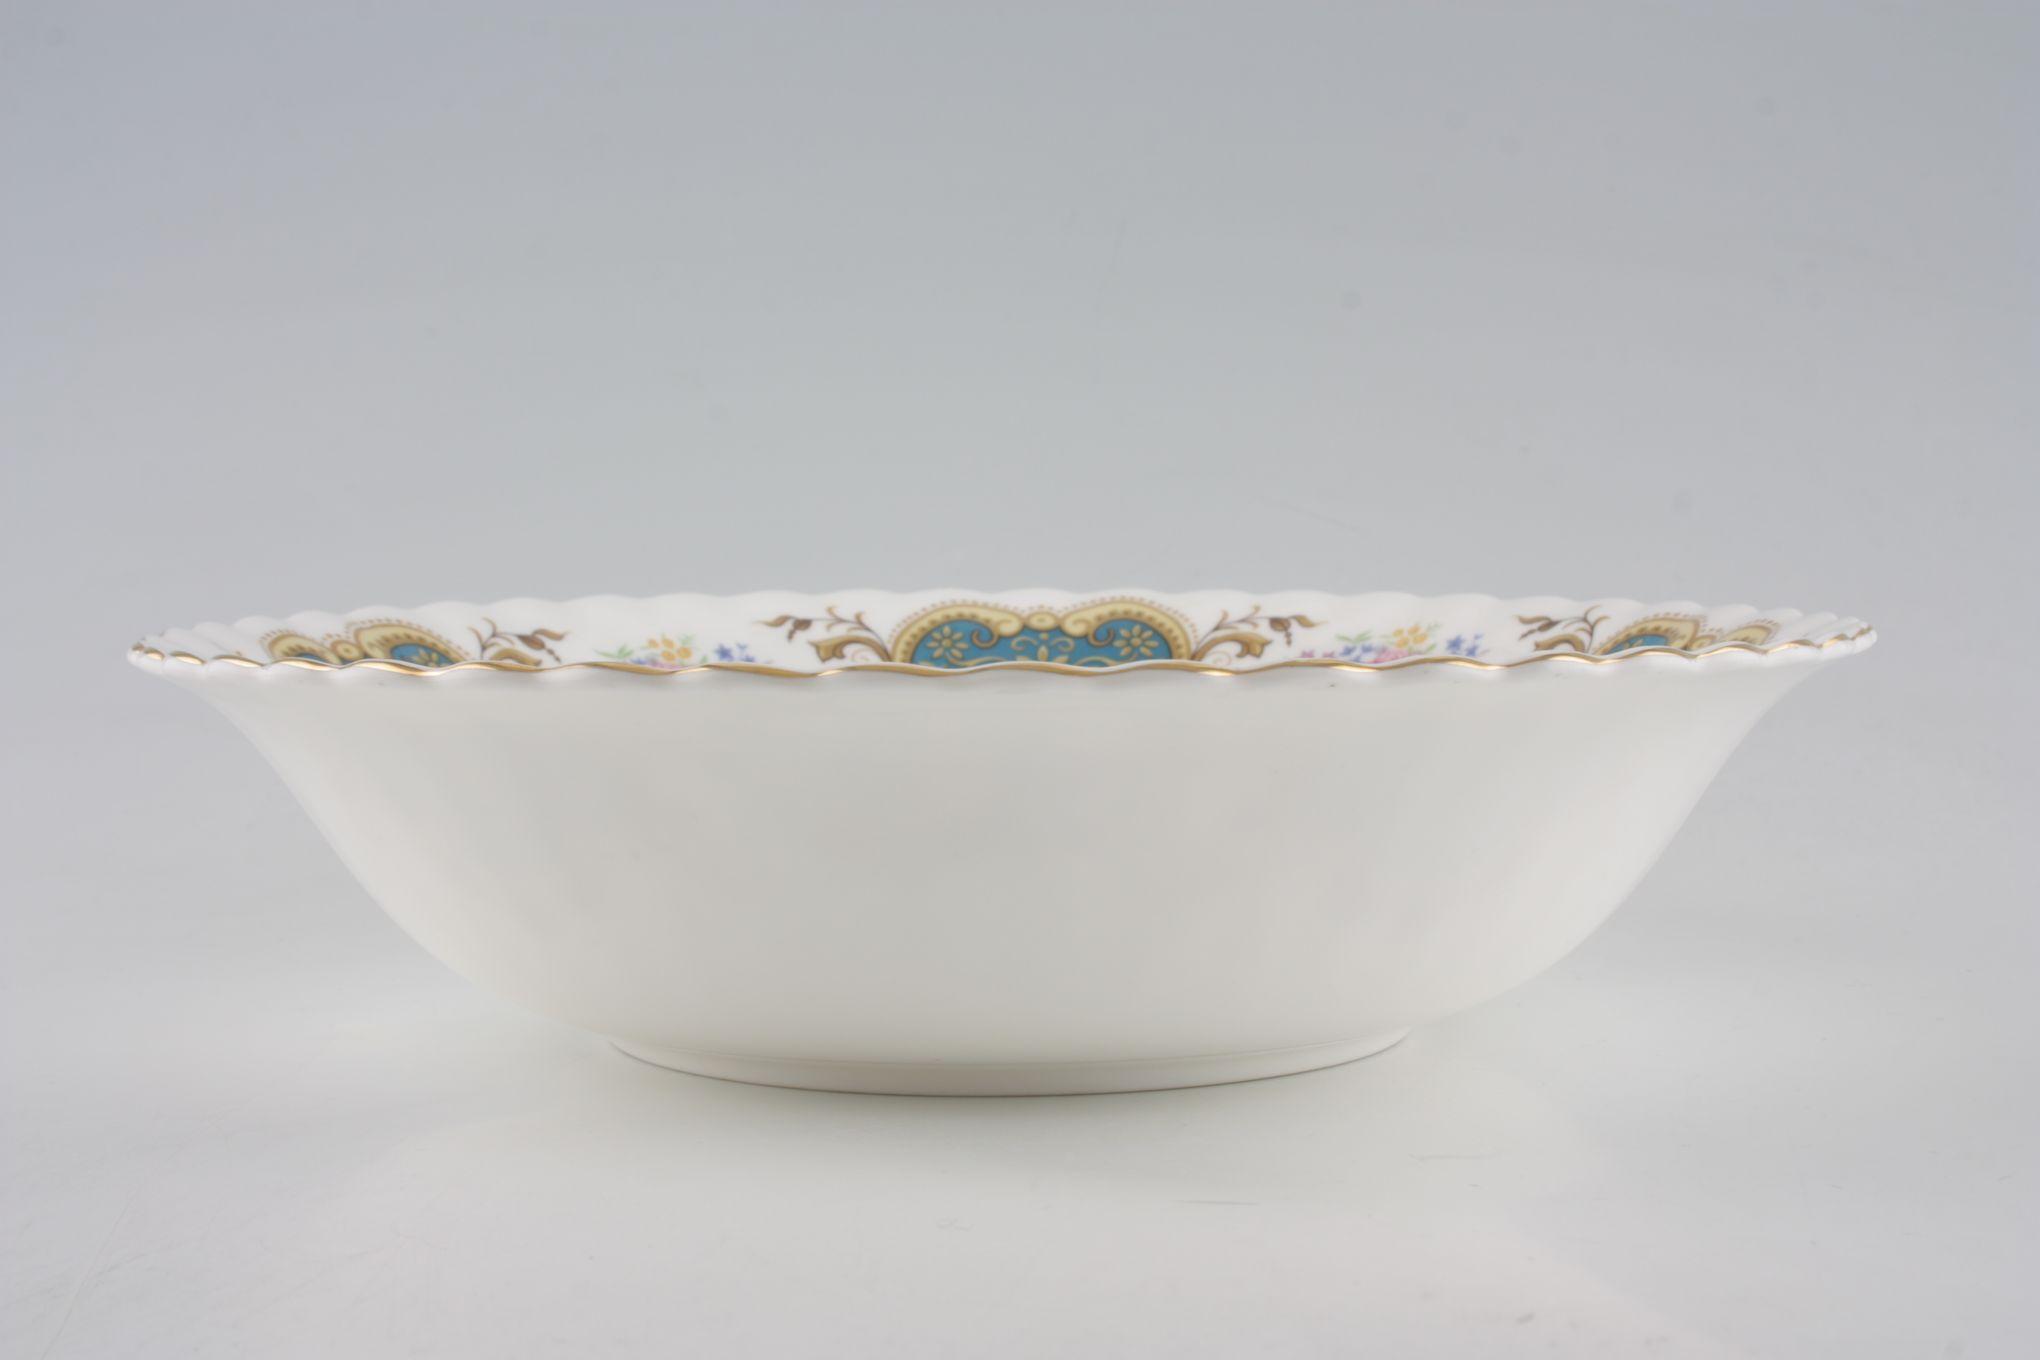 "Royal Albert Berkeley Salad Bowl 9 1/4"" thumb 1"